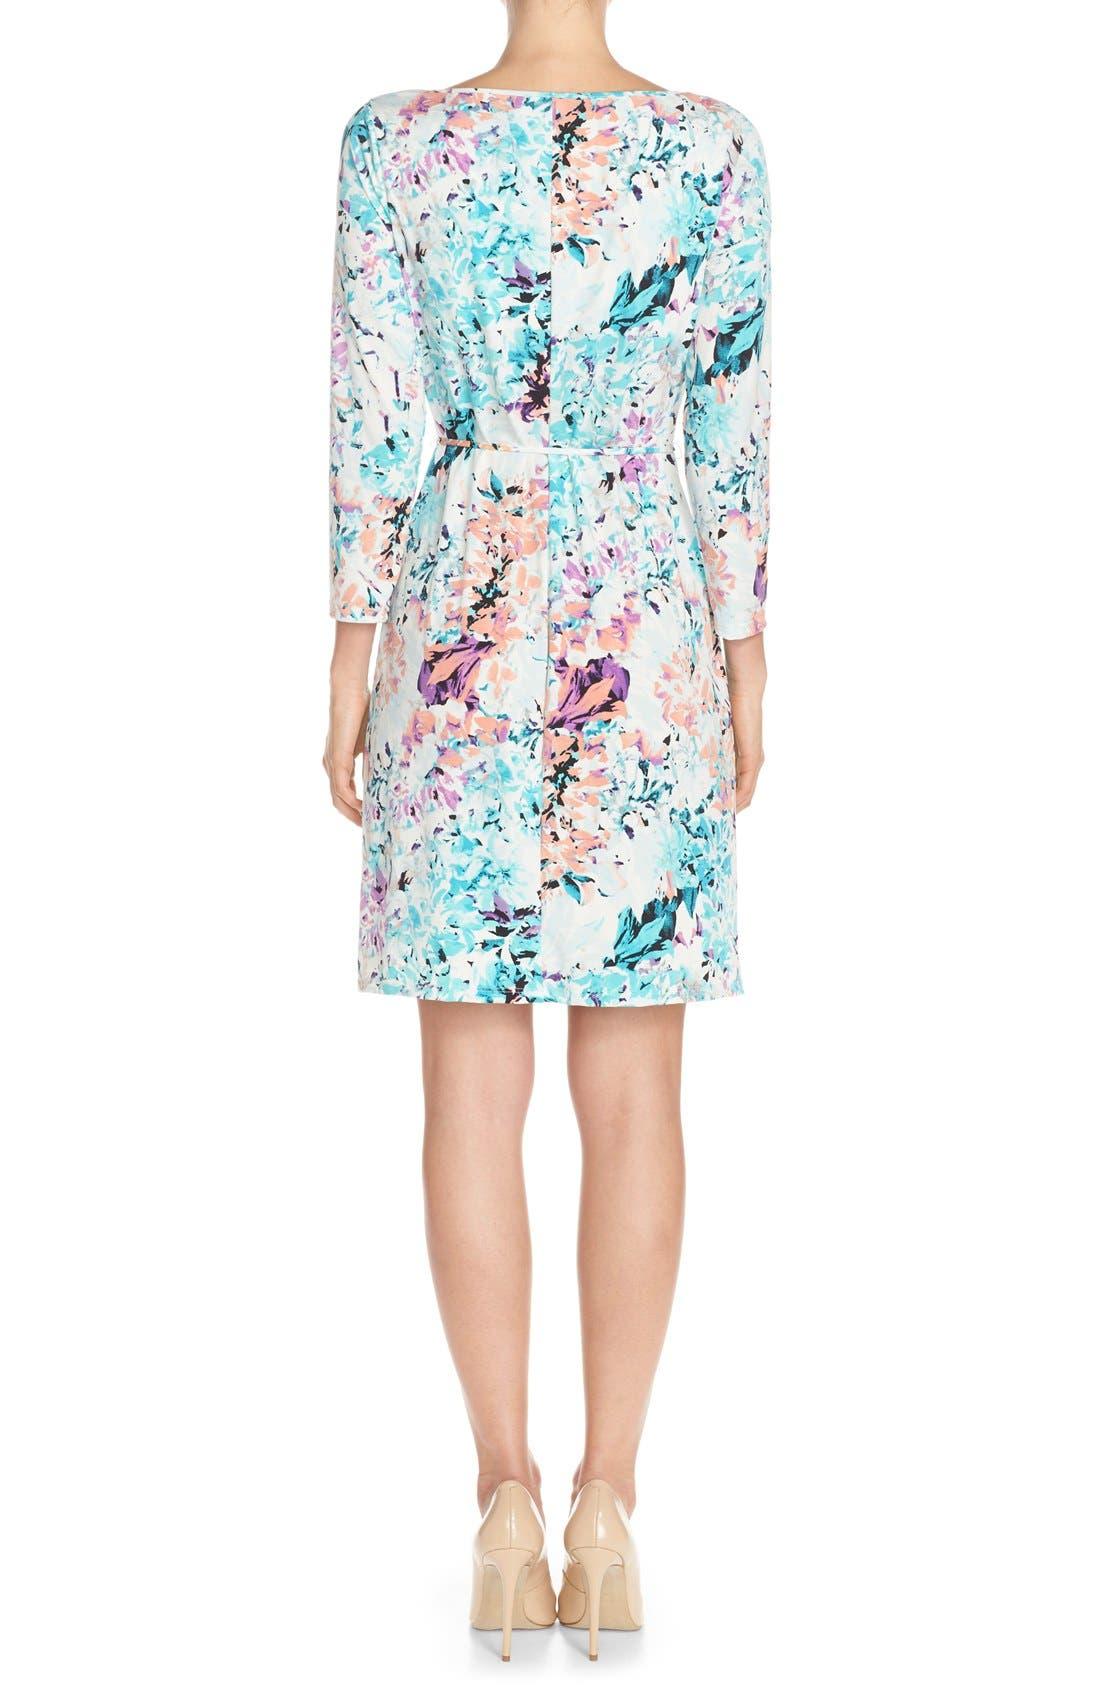 IVANKA TRUMP, Floral Print Jersey A-Line Dress, Alternate thumbnail 6, color, 101